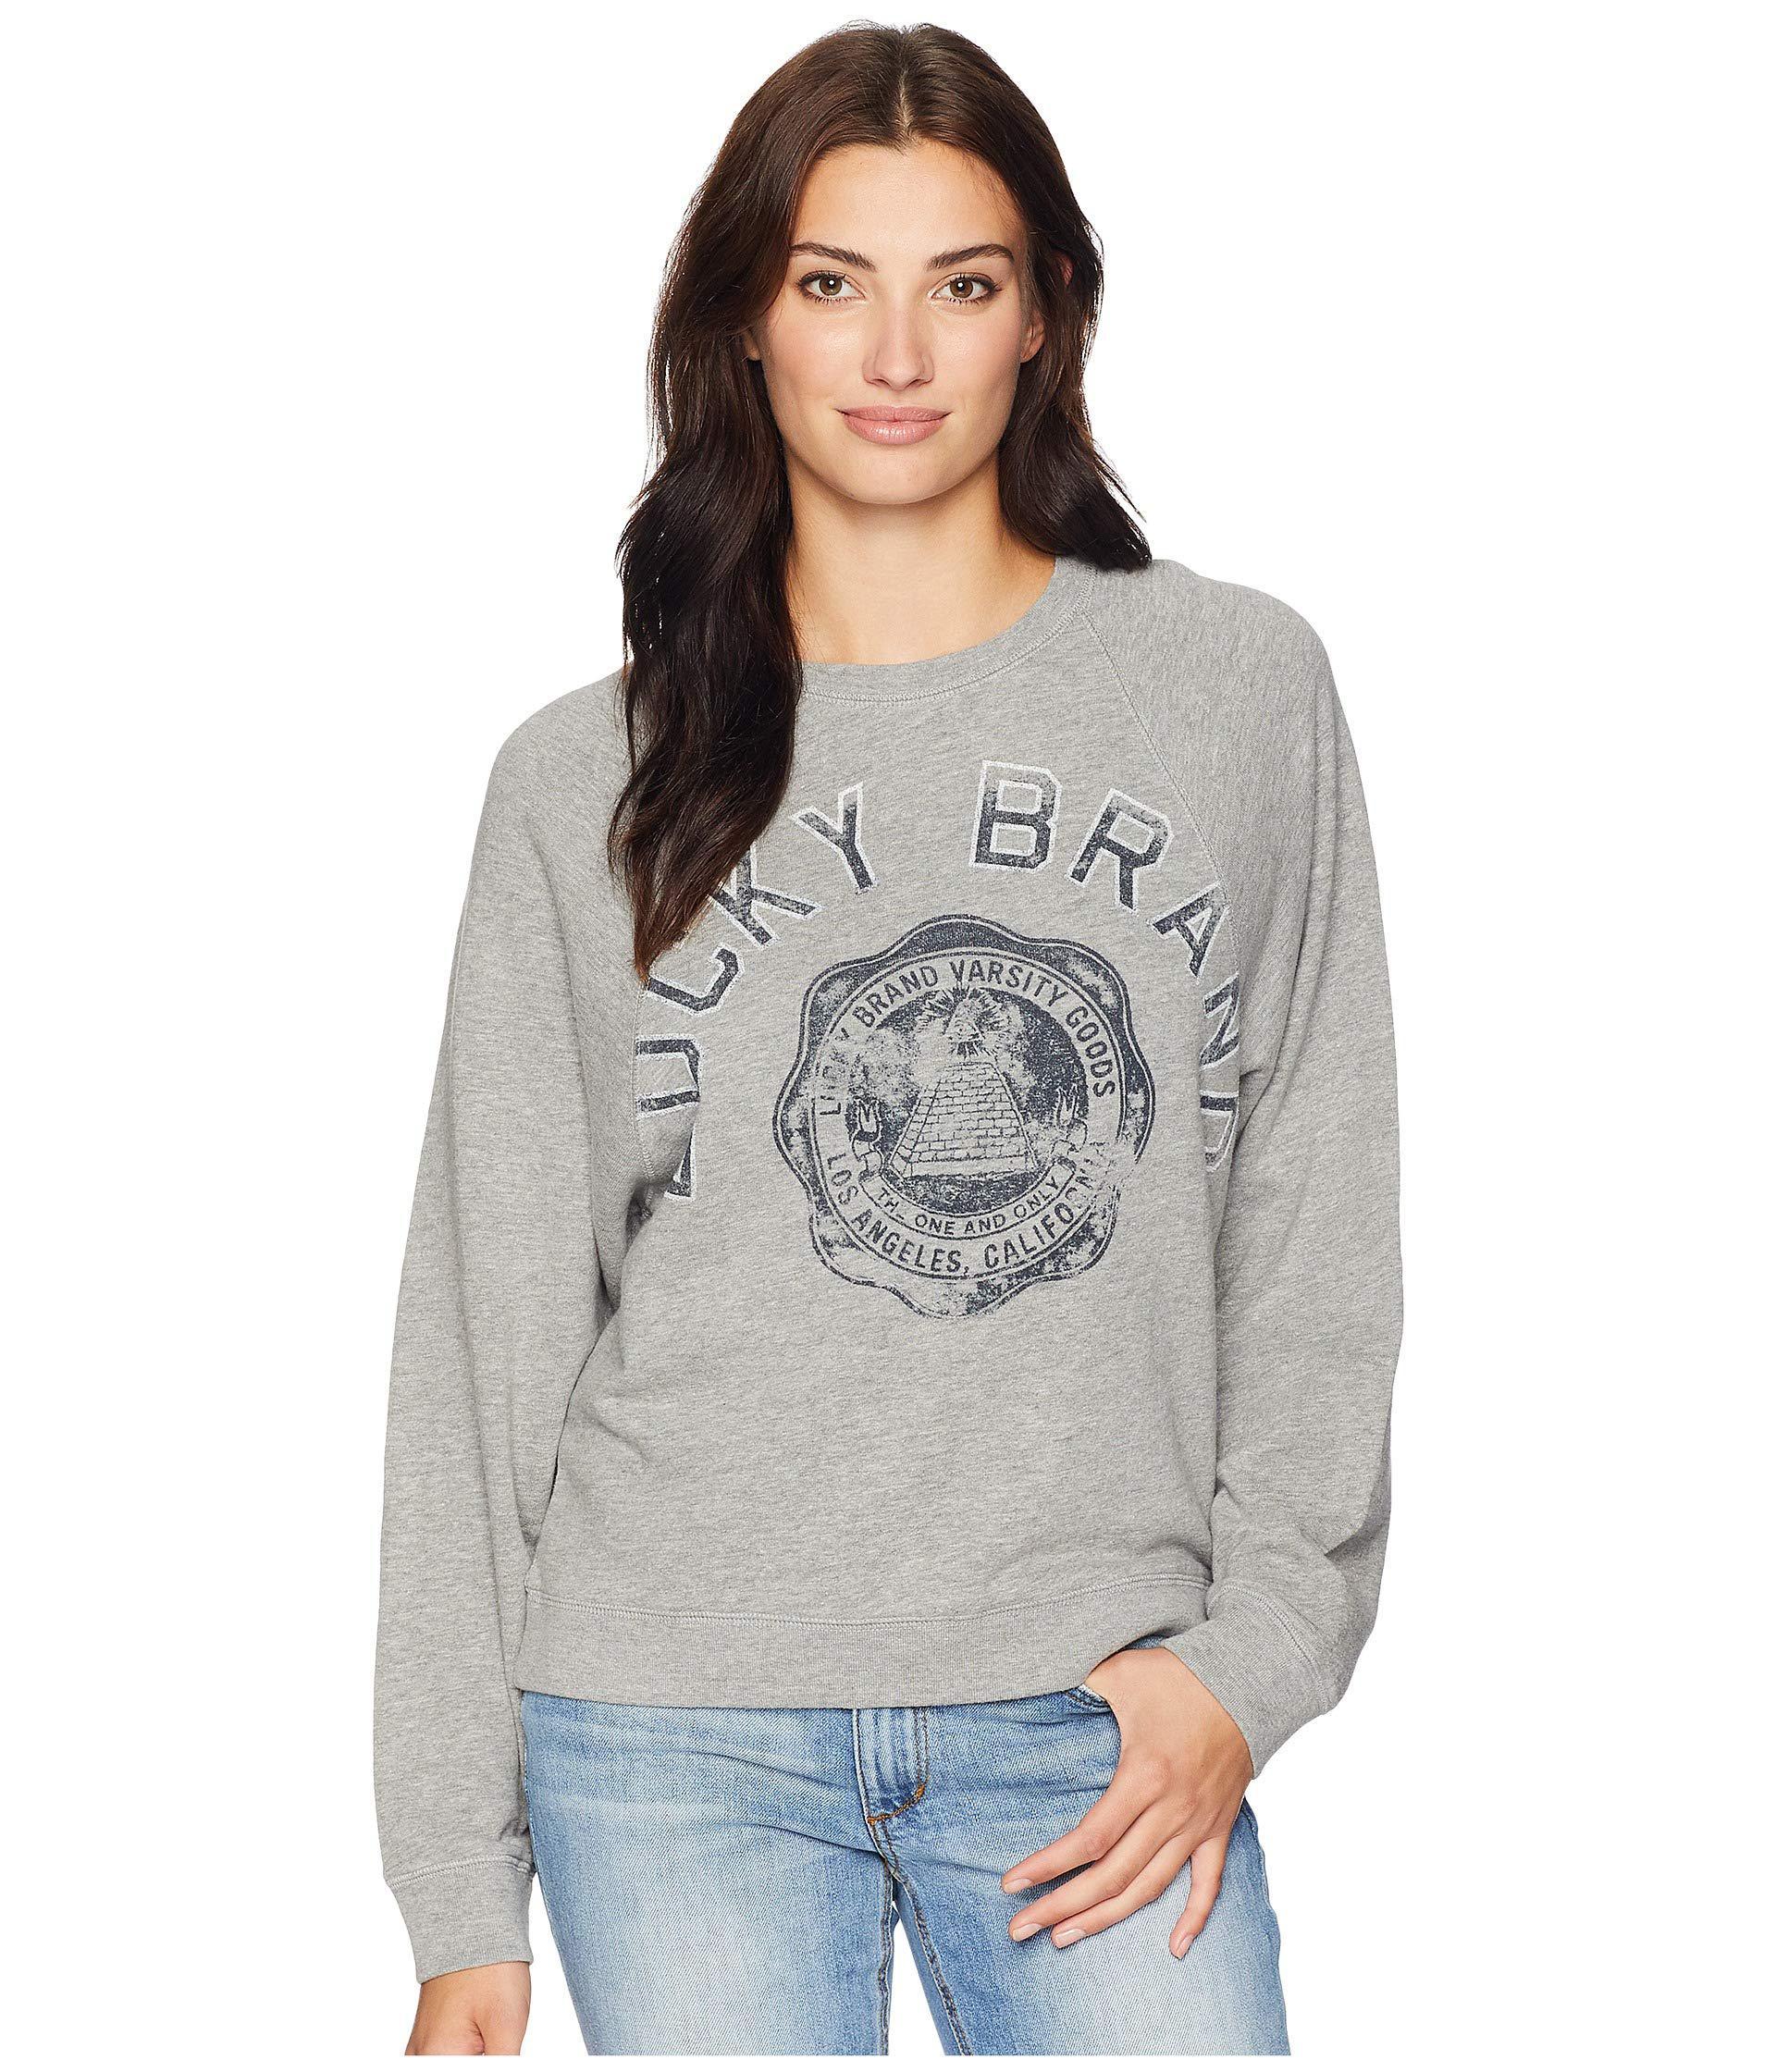 9037ad7ee7be Lyst - Lucky Brand Lucky Varsity Pullover Sweatshirt (heather Grey ...